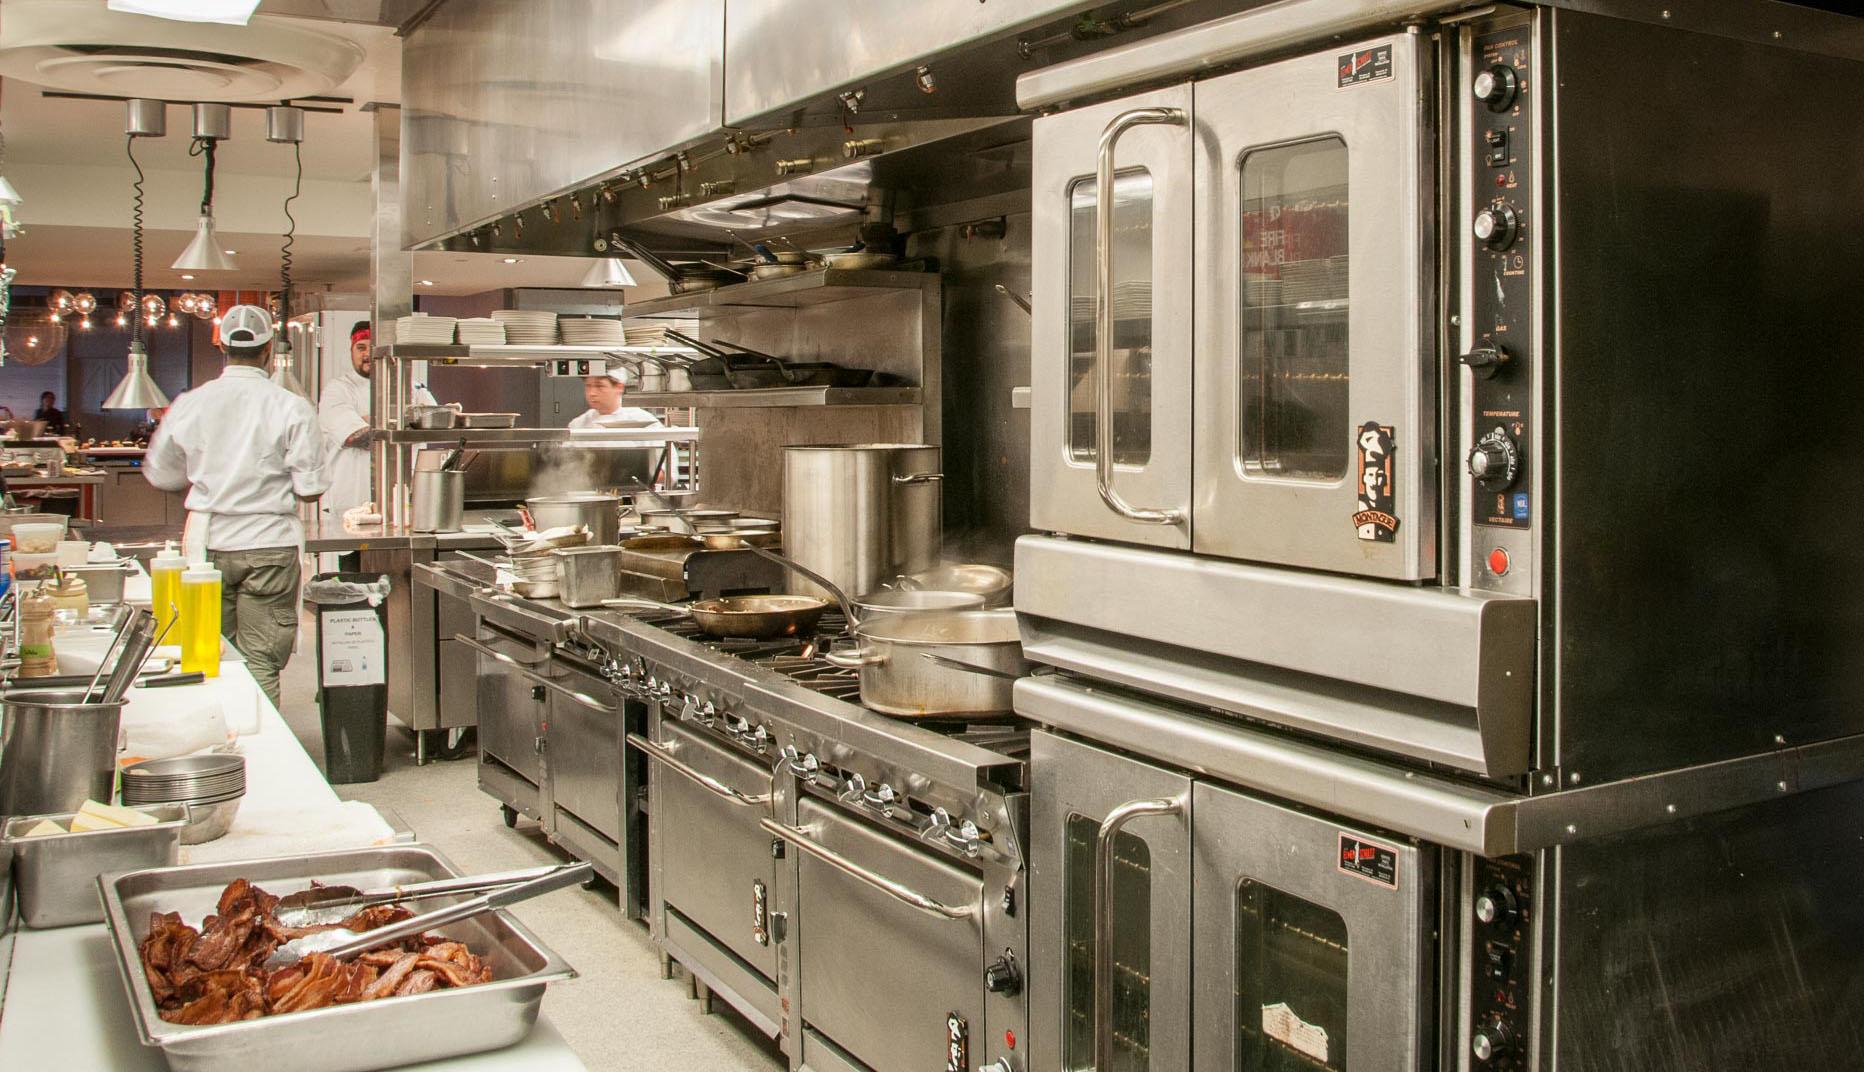 commercial kitchen supply whiteboard m tucker new york city restaurant supplies equipment design build